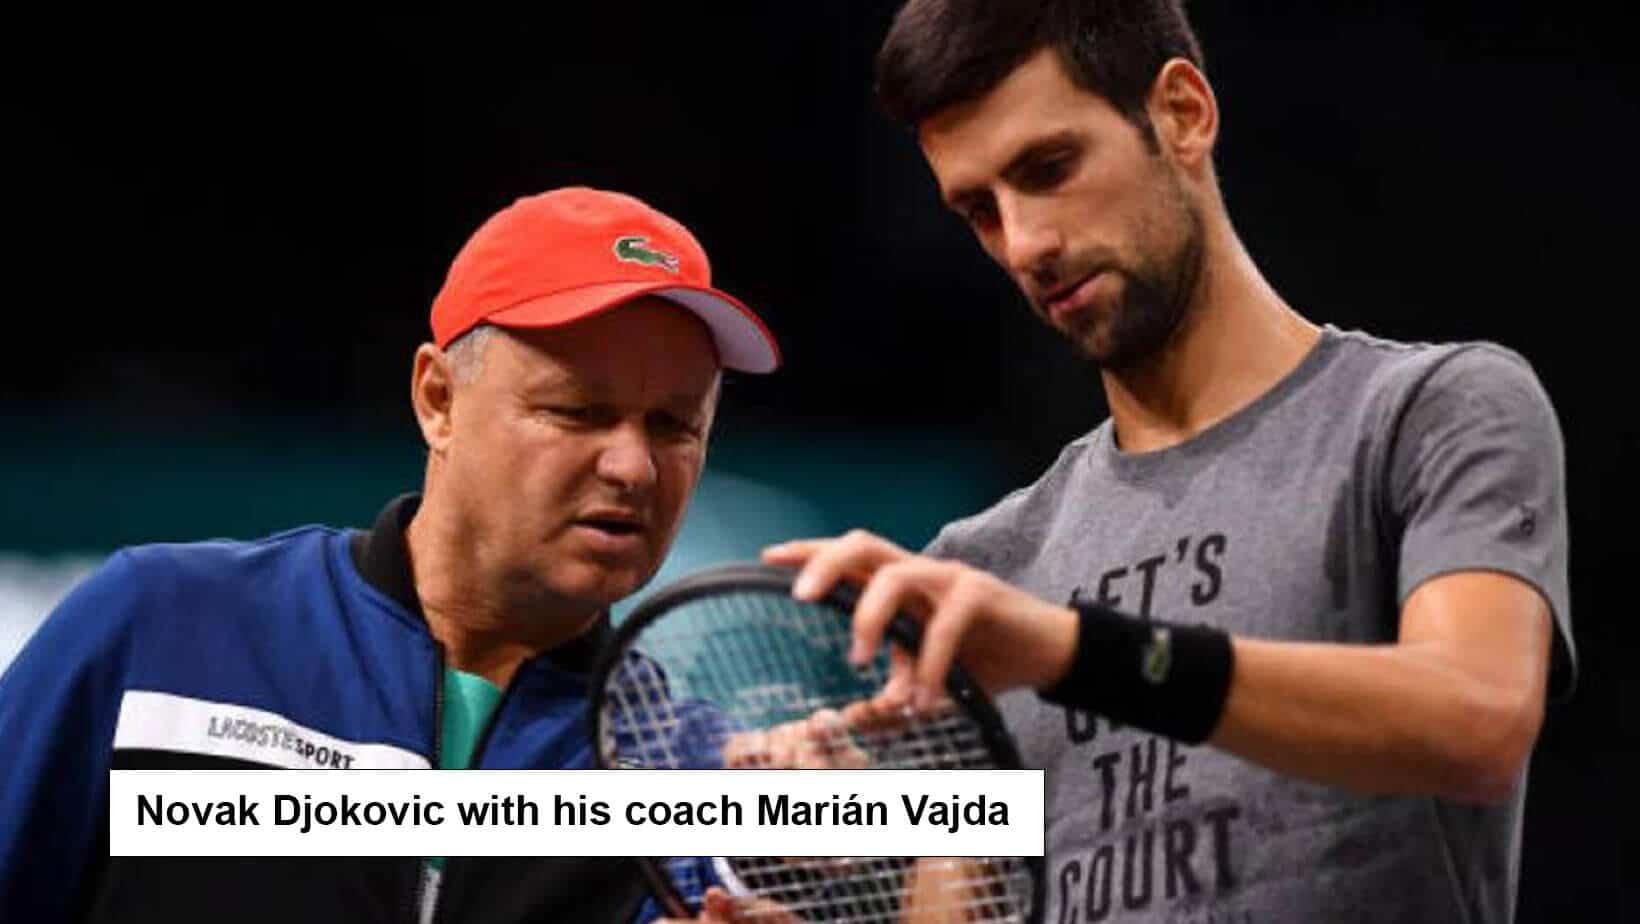 Novak Djokovic with his coach Marián Vajda